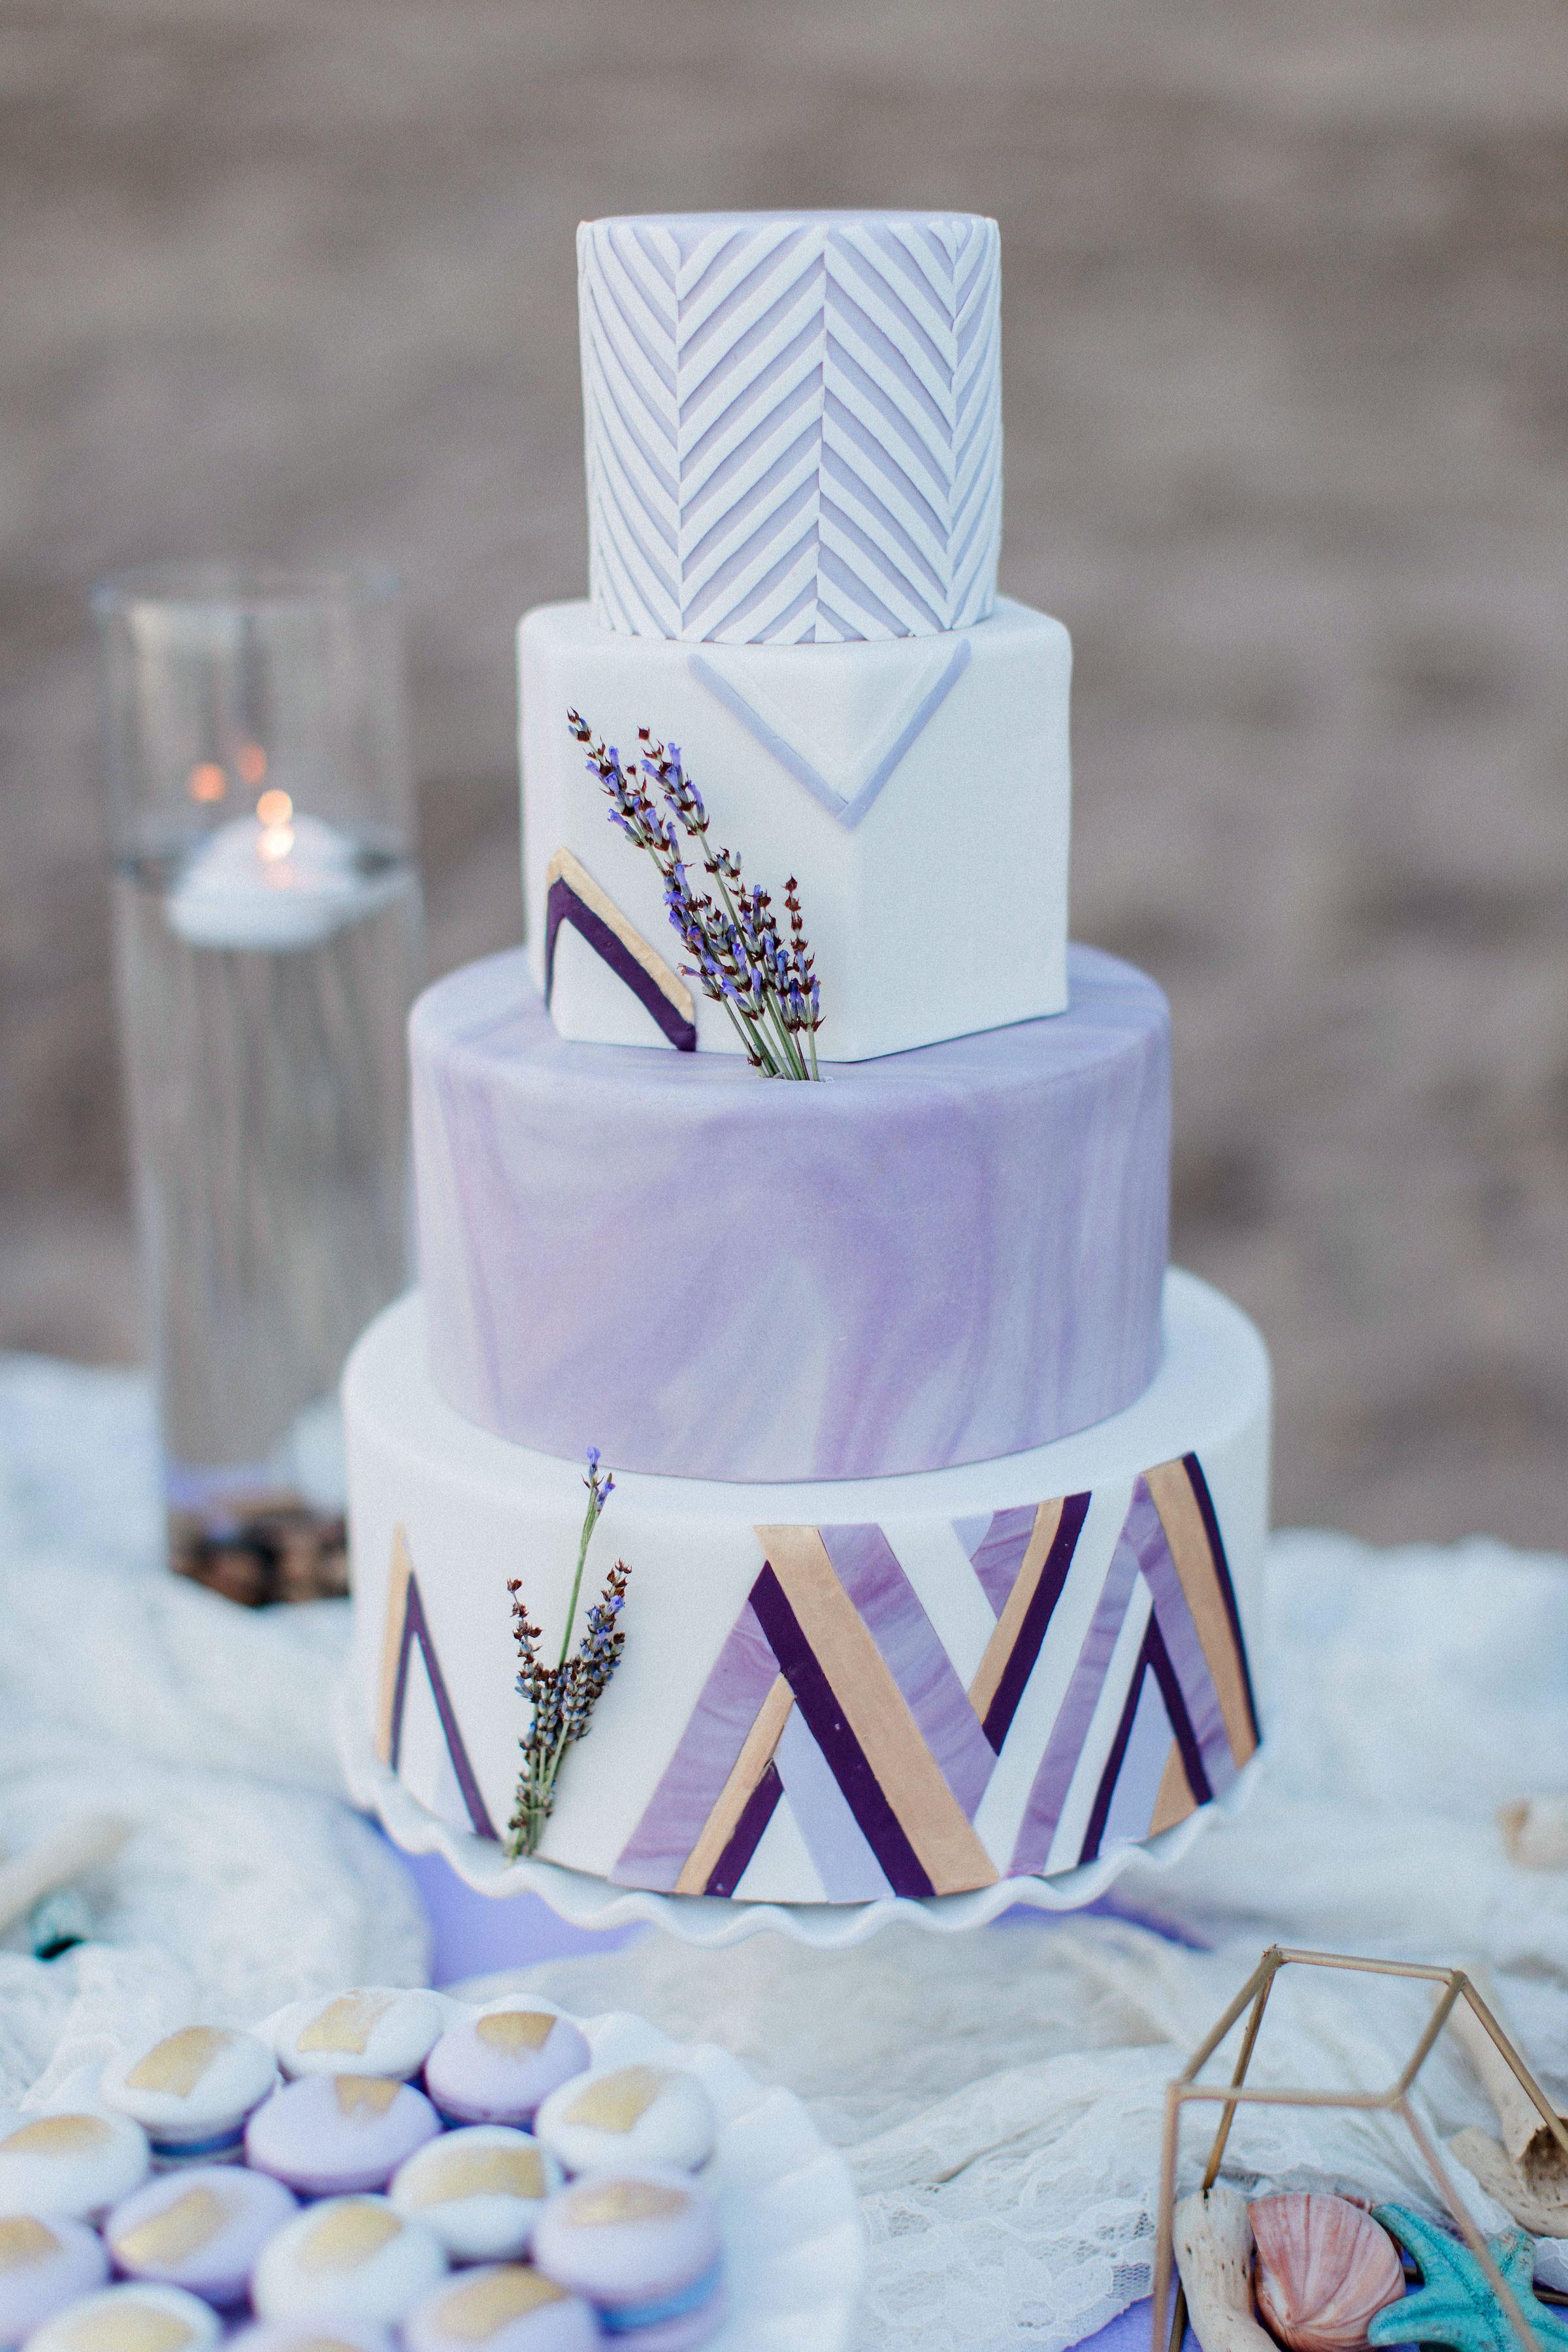 Lavender and white wedding cake